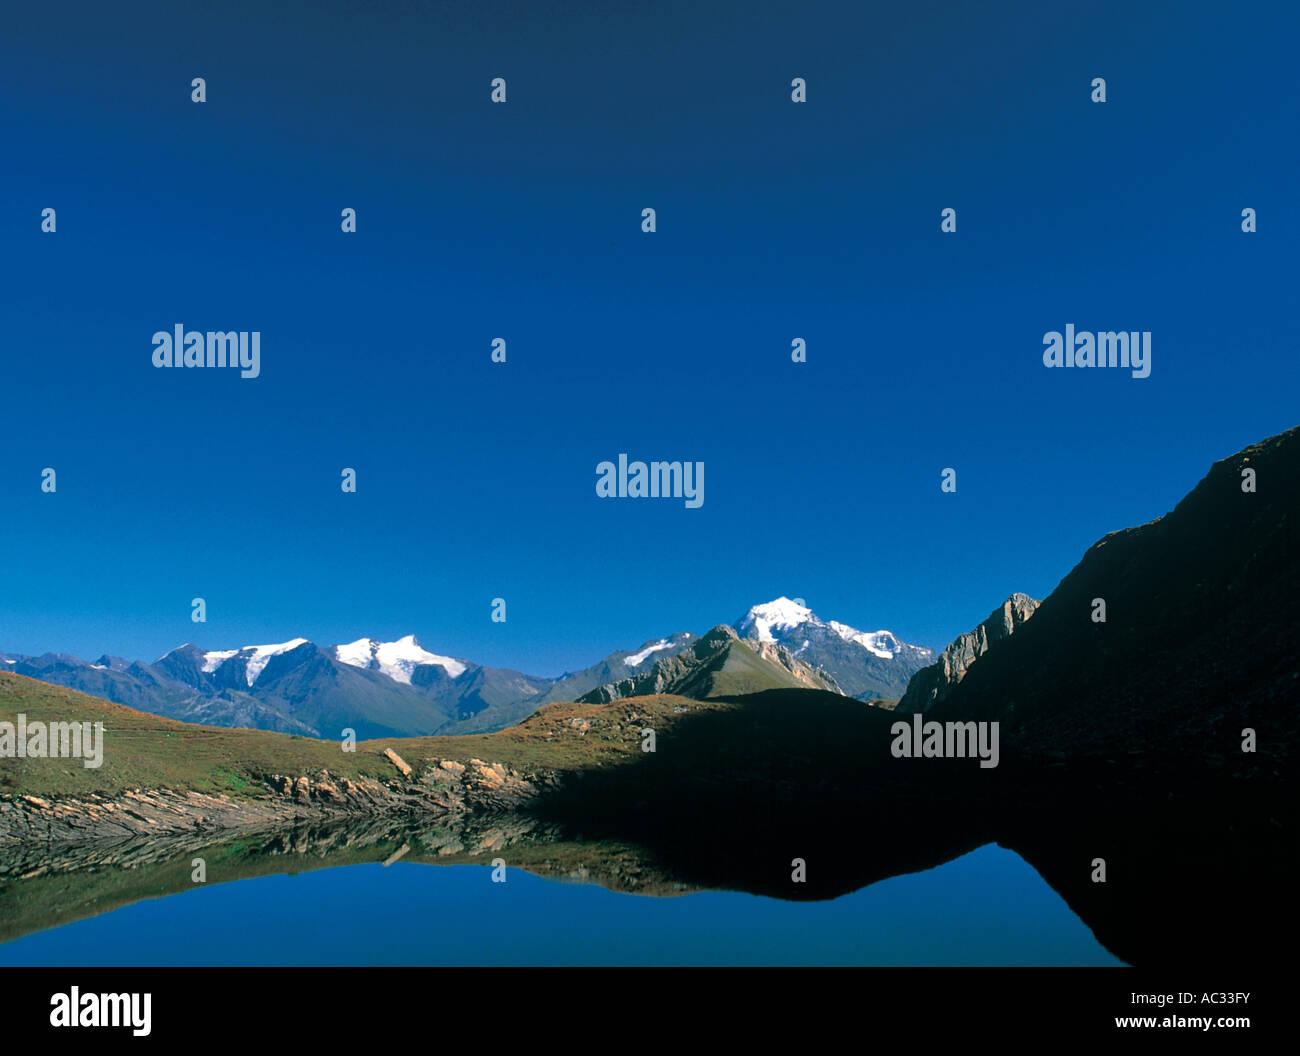 area called the 5 lakes under Bourg Saint Maurice, France, Savoie, Nationalpark Vanoise - Stock Image